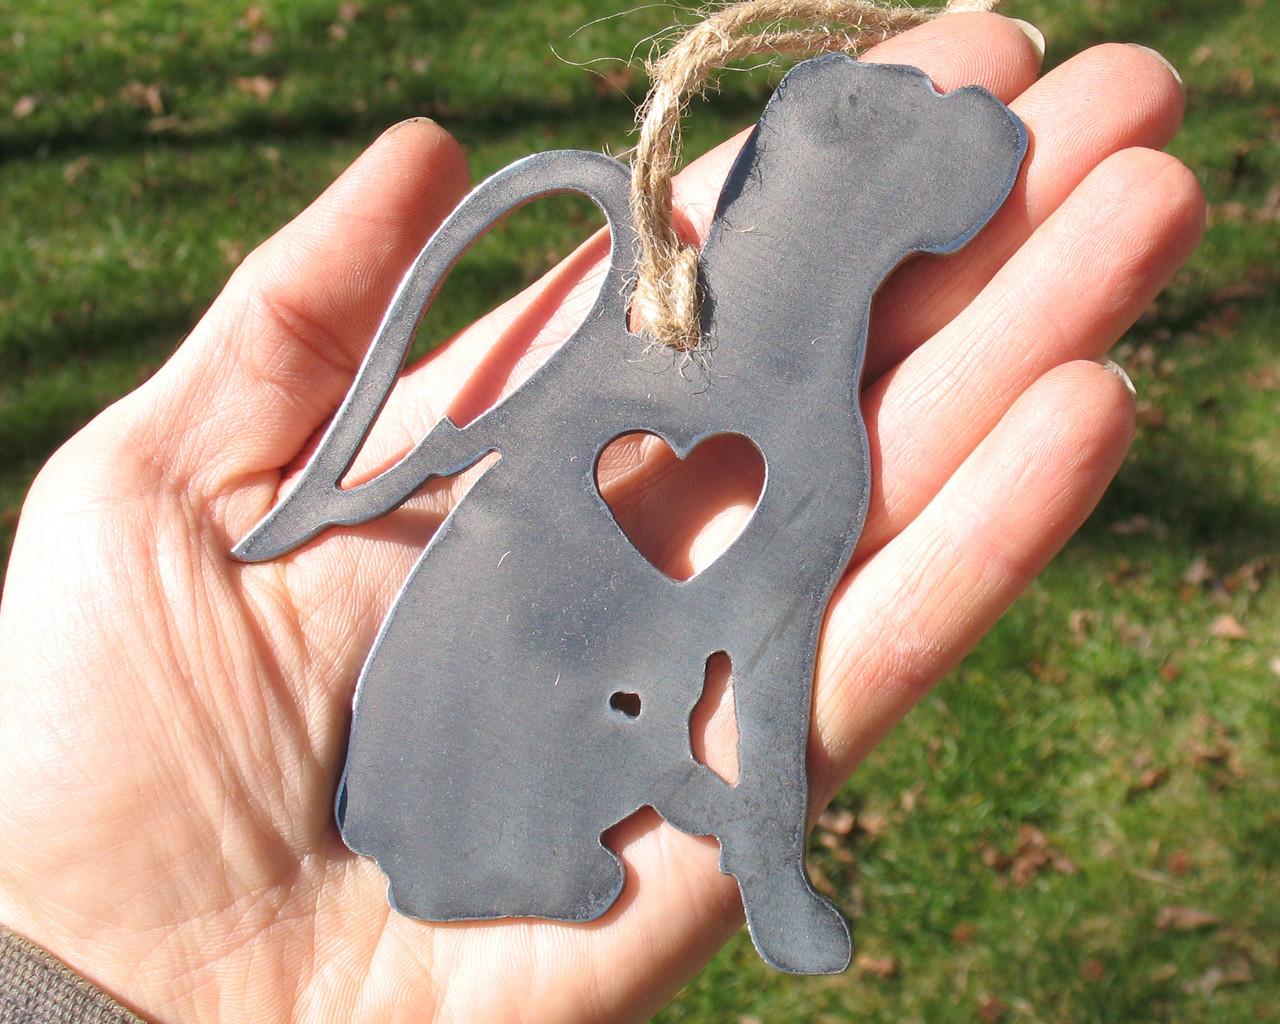 Boxer Dog Ornament 1 Pet Memorial W/ Angel Wings - Pet Loss Dog Sympathy Remembrance Gift - Metal Dog Christmas Ornament